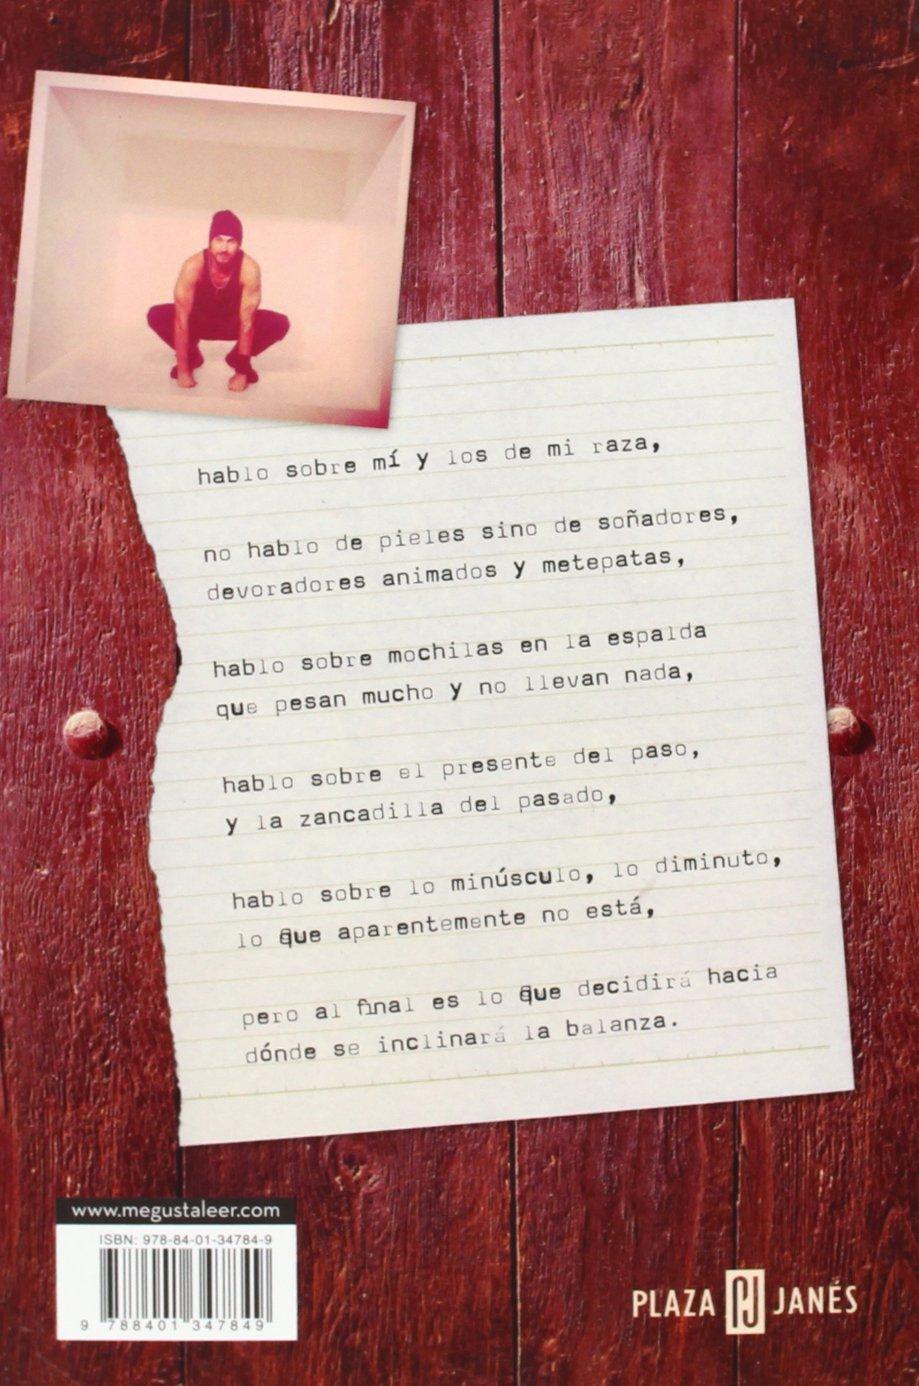 Amazon.com: Amor a lo diminuto / Love For The Tiny Things (Spanish Edition) (9788401347849): Dani Macaco: Books